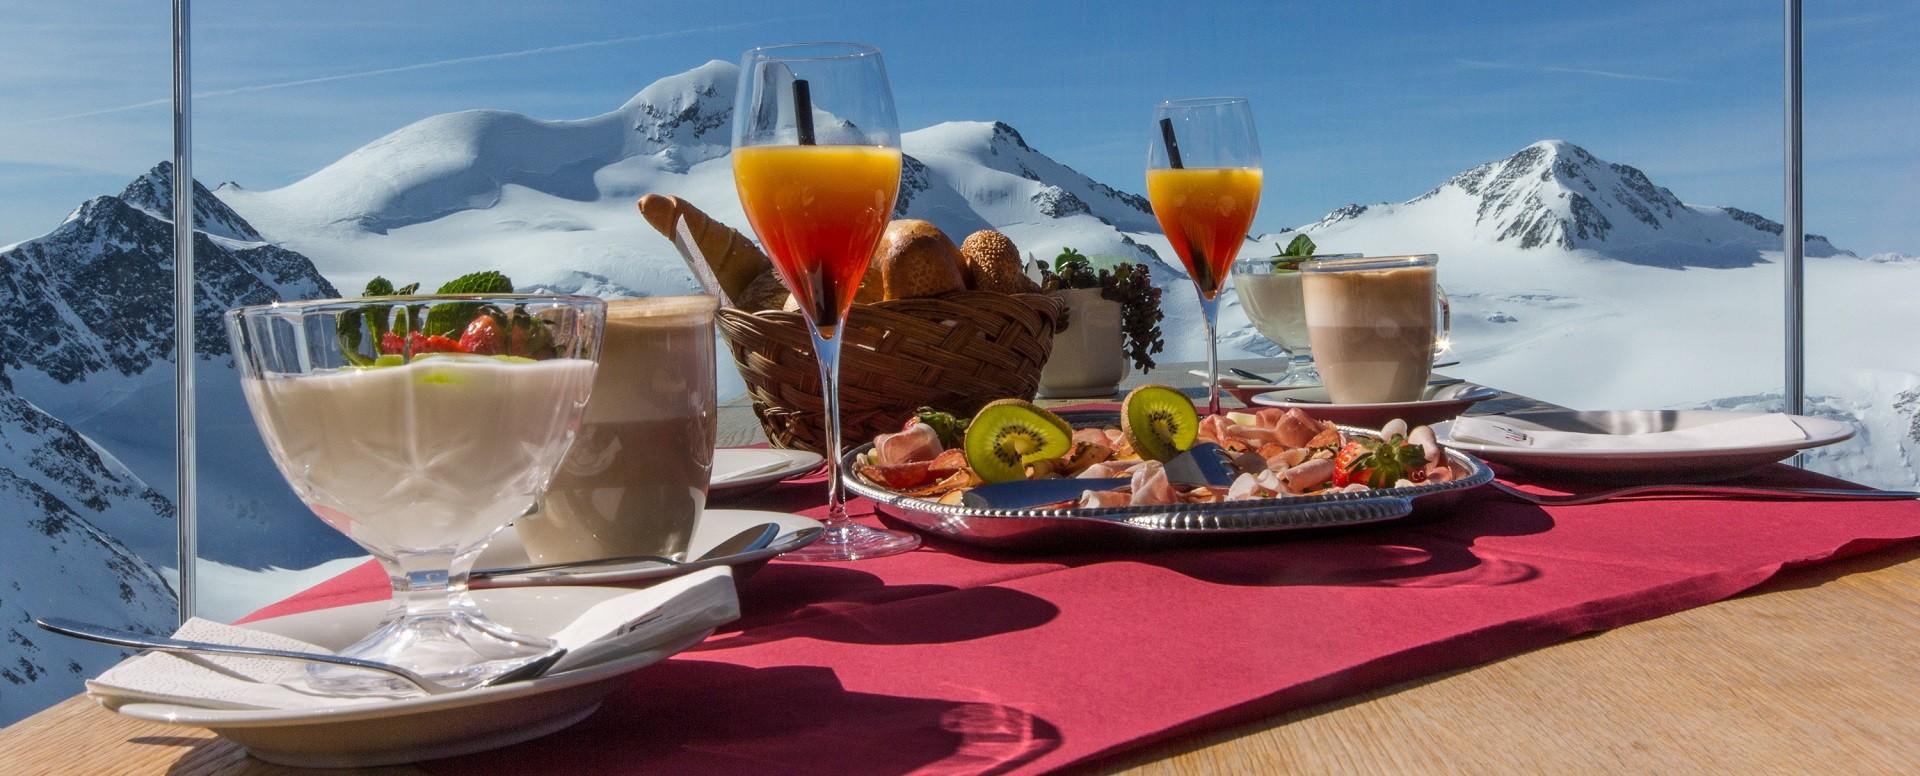 Tirols höchstes Frühstück